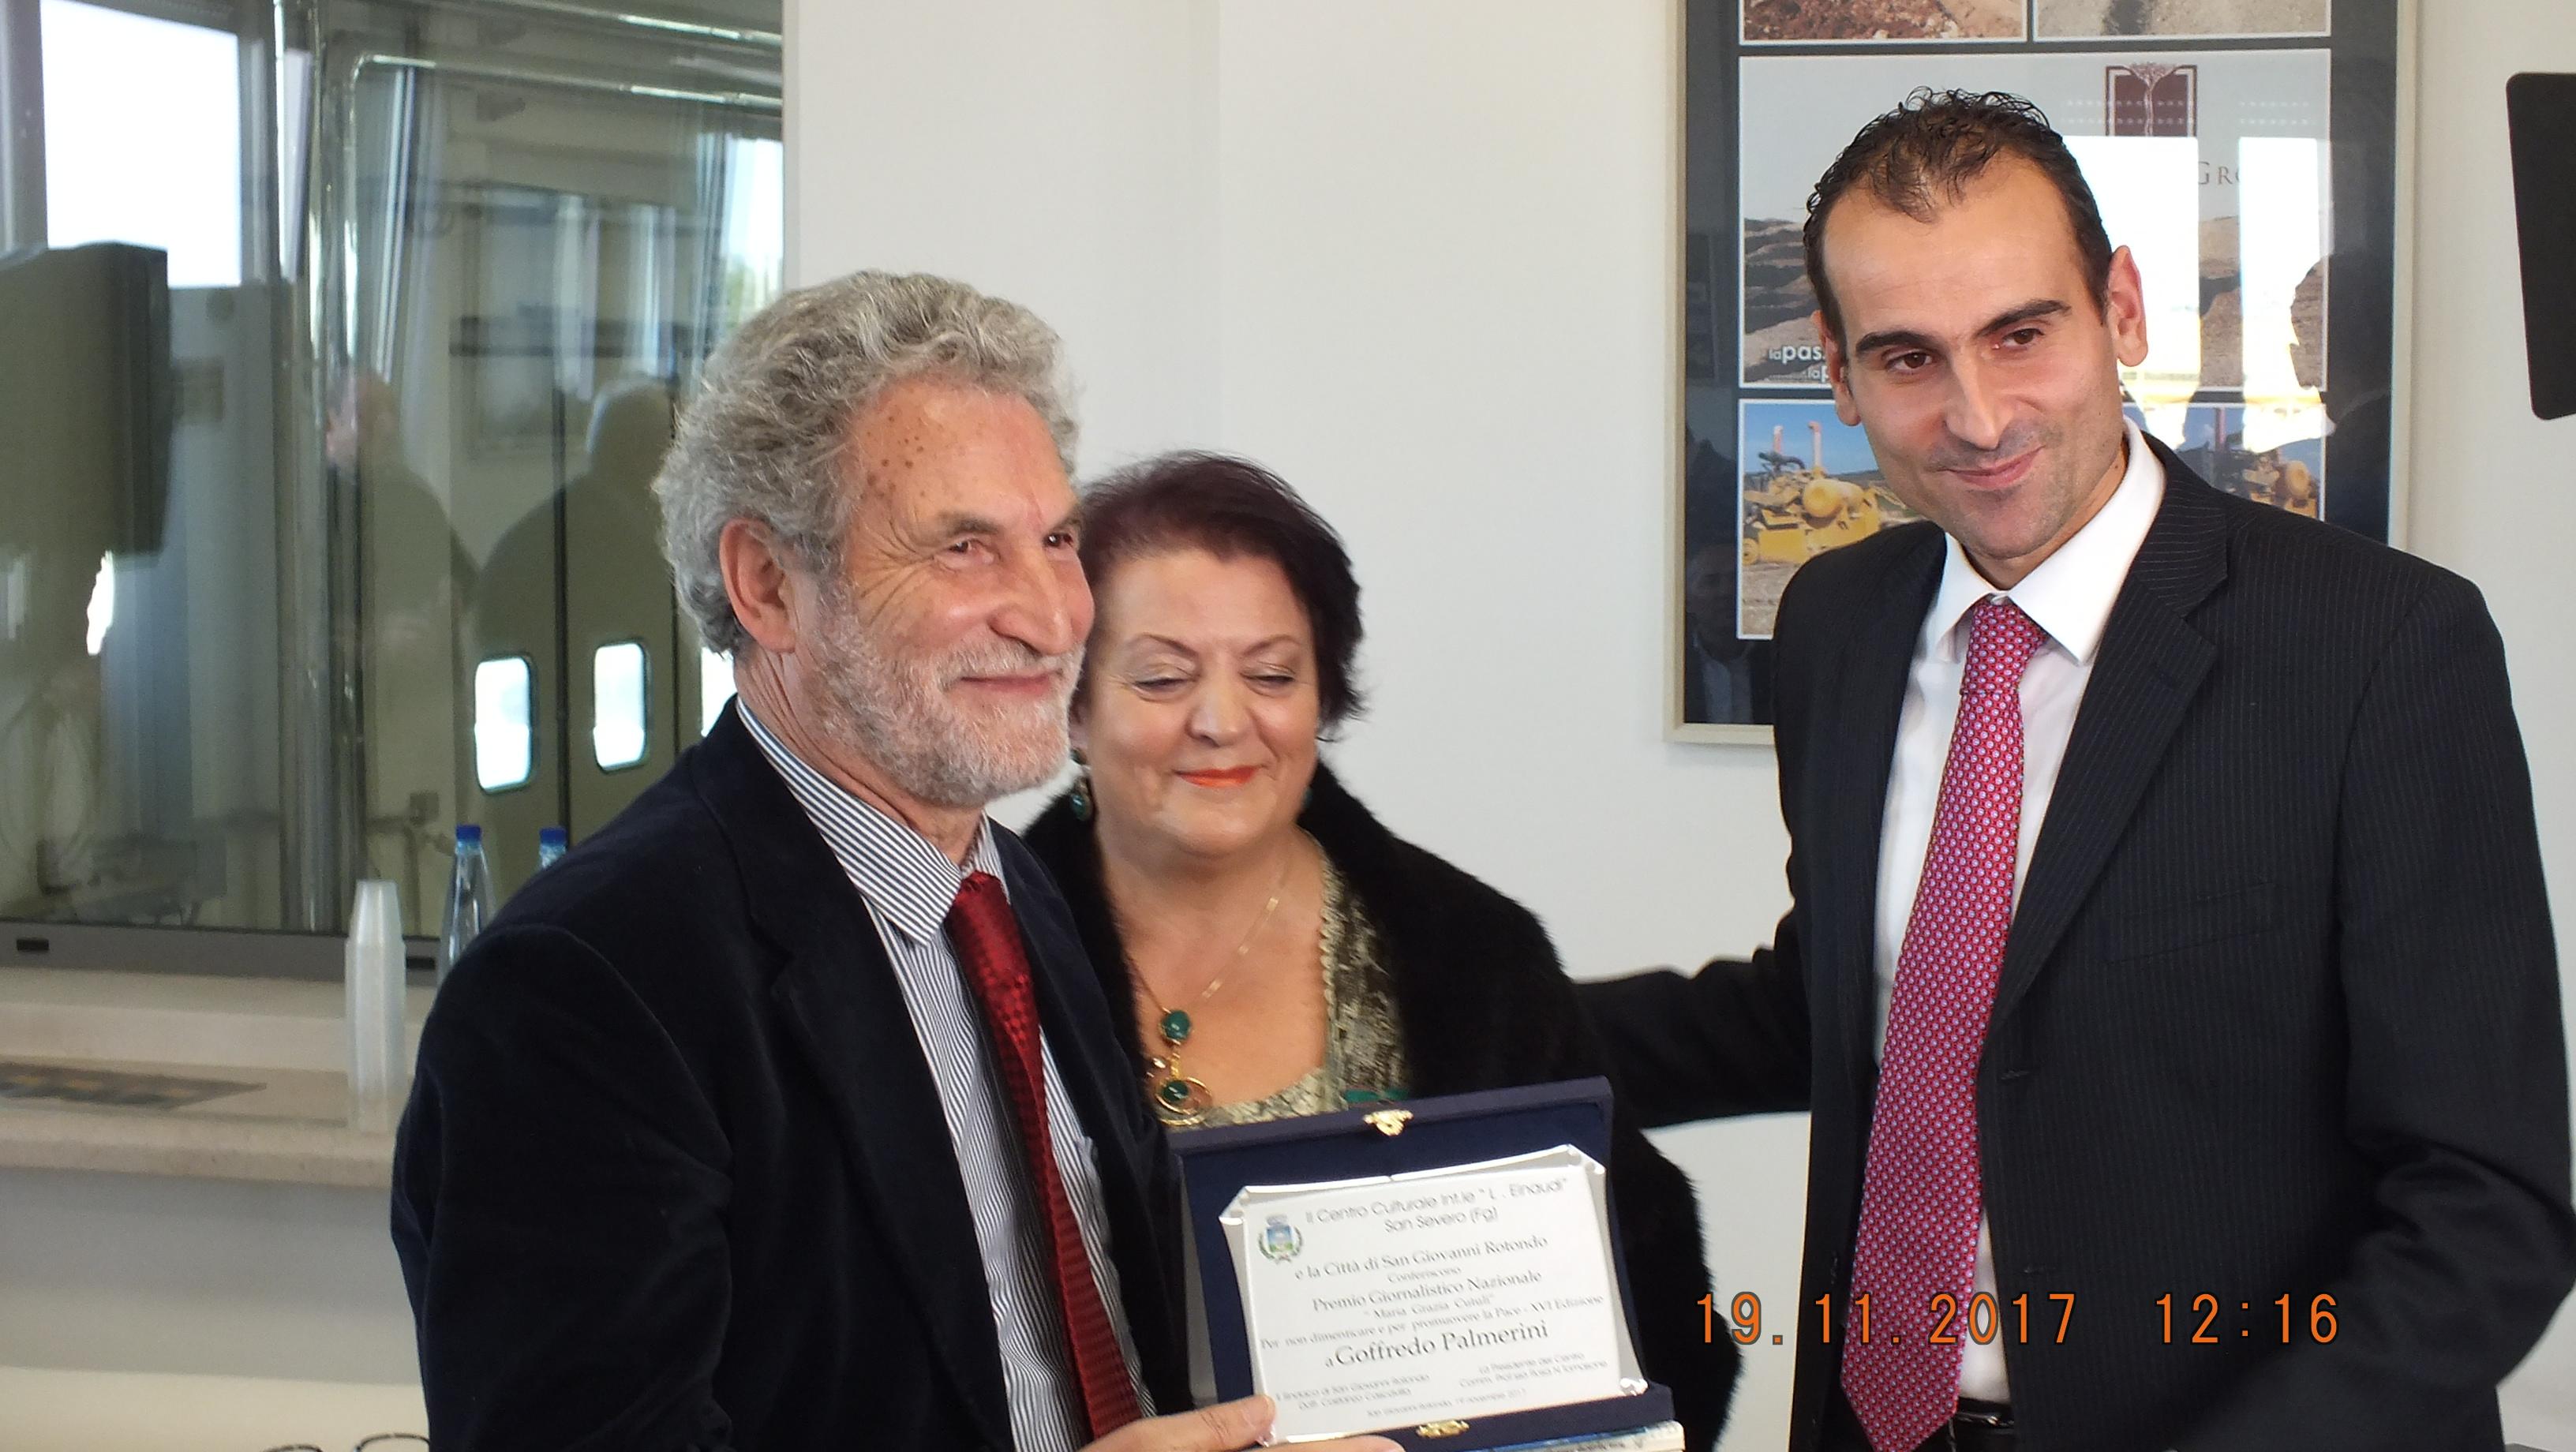 2017 a sin. G.Palmerini